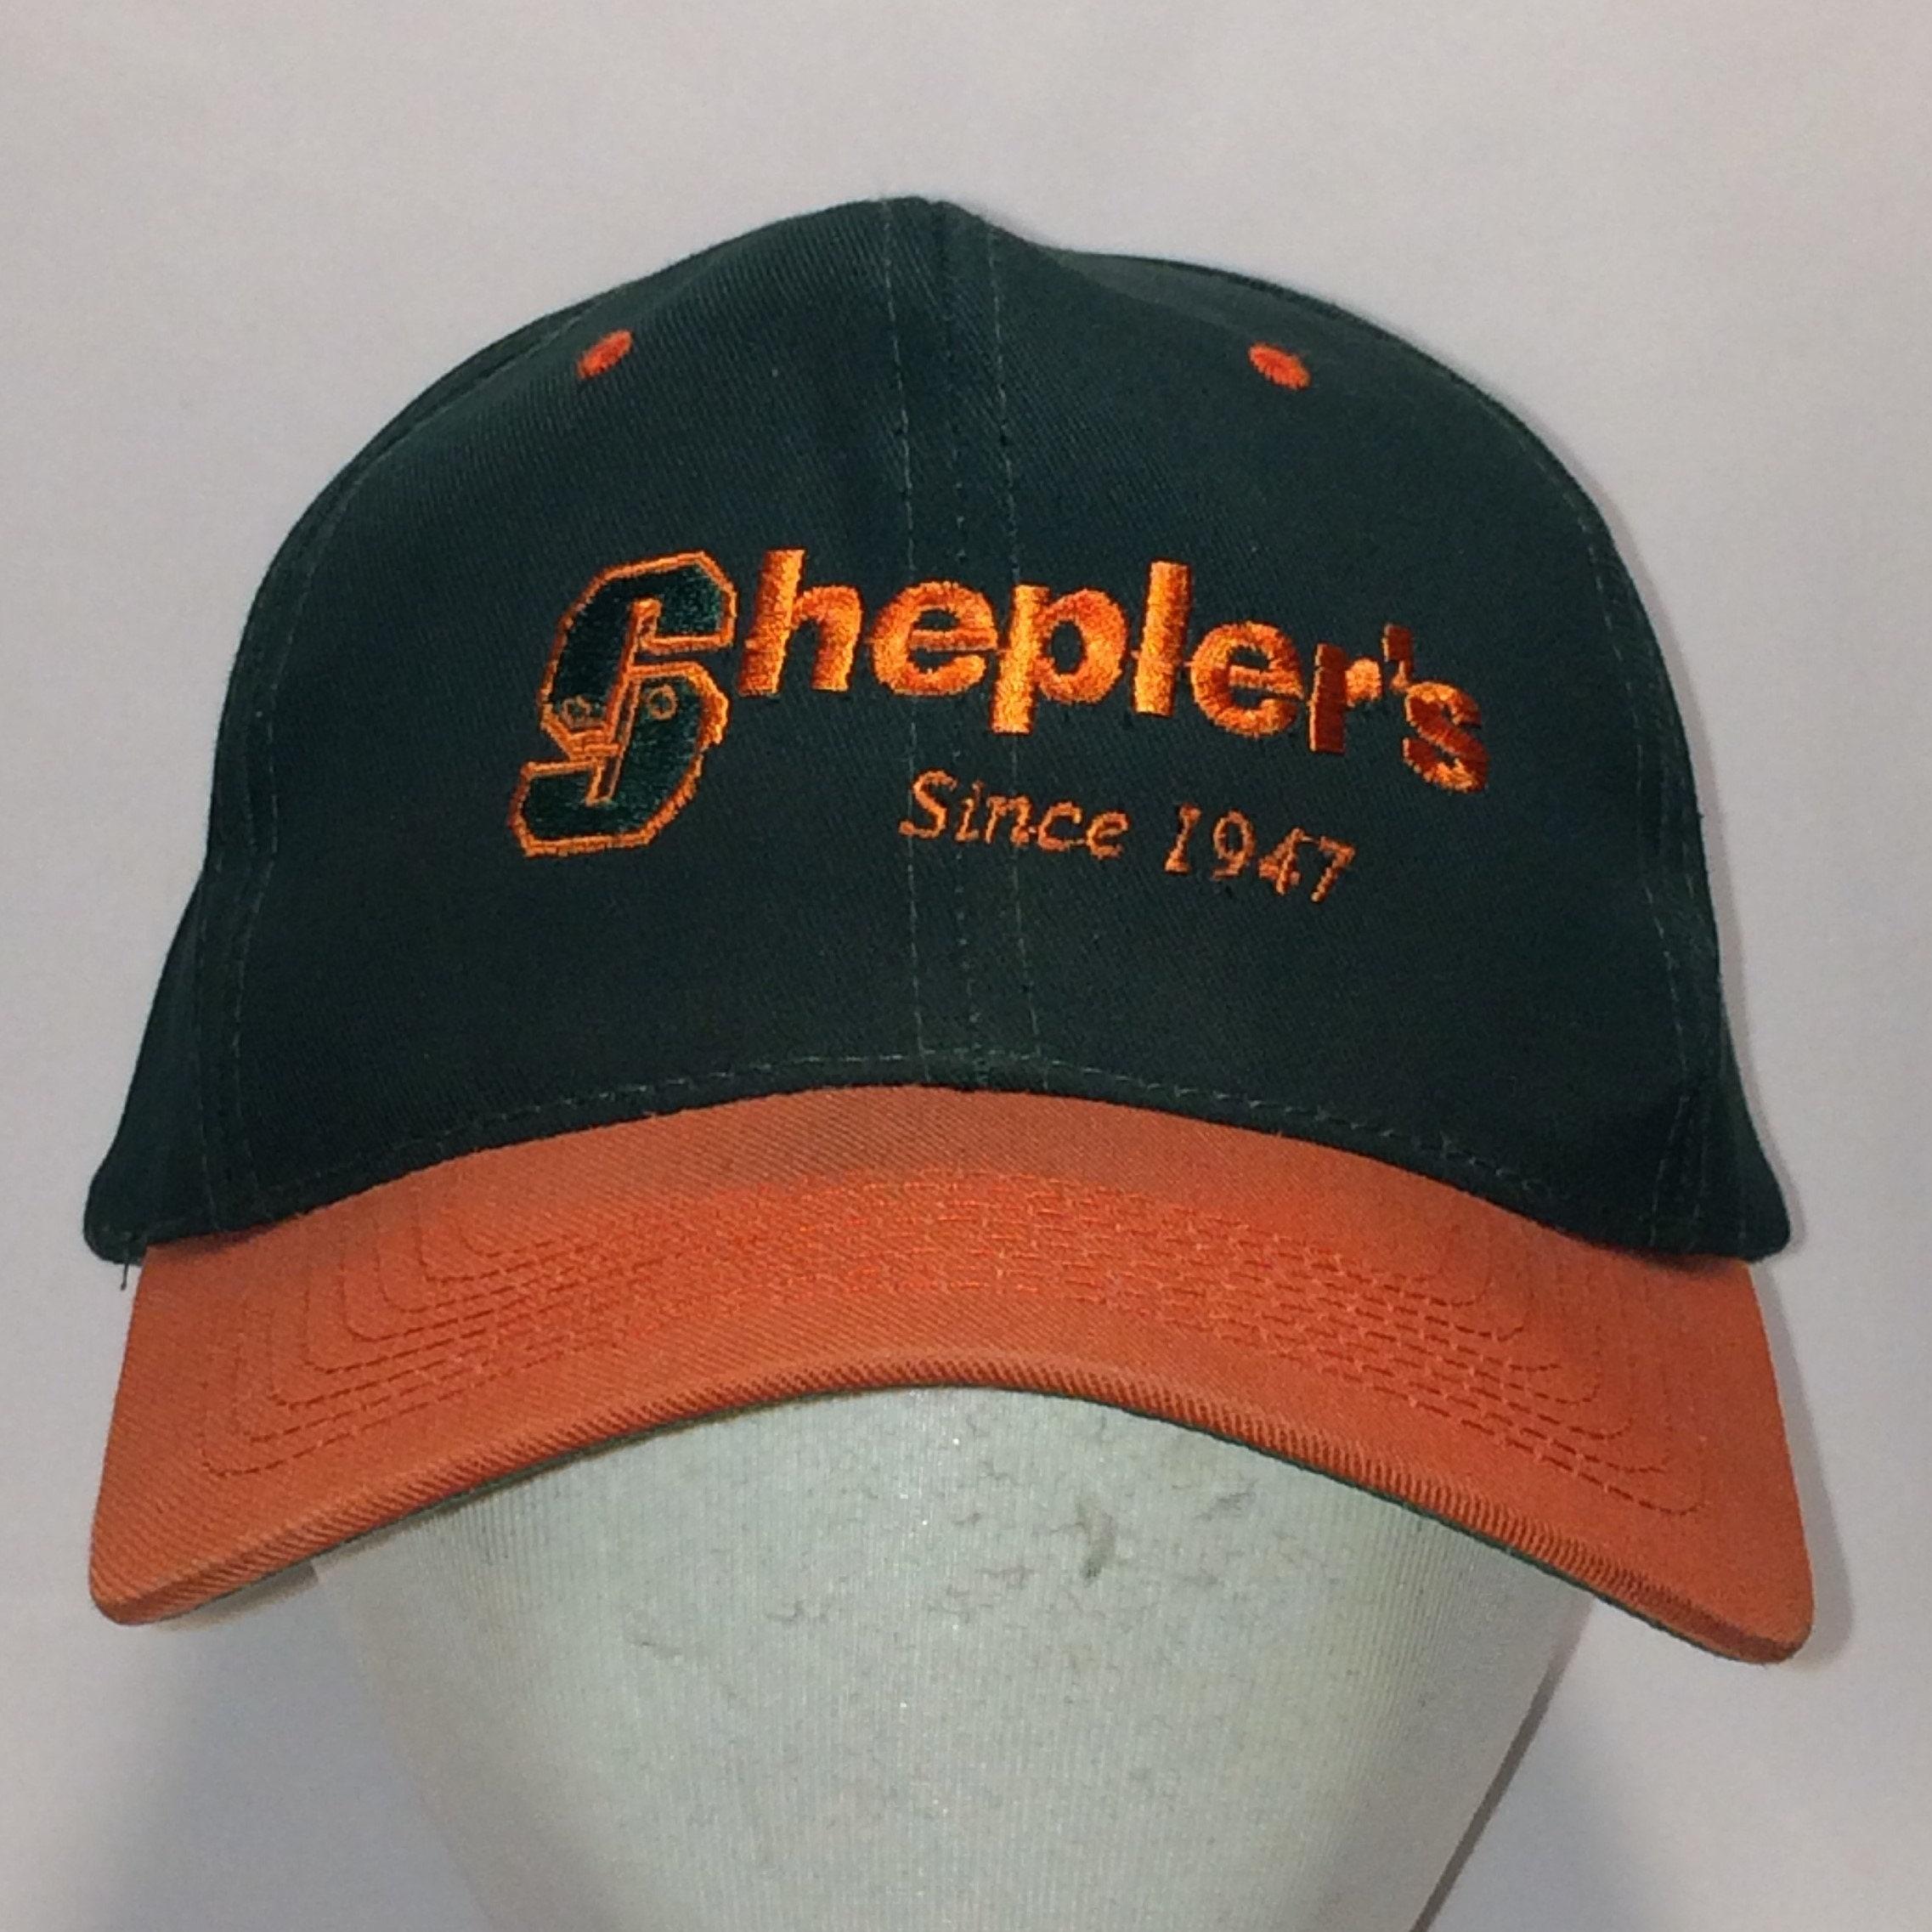 Vintage Snapback Sheplers Hat Green Orange Baseball Cap Hats  c2abf8e8a6d